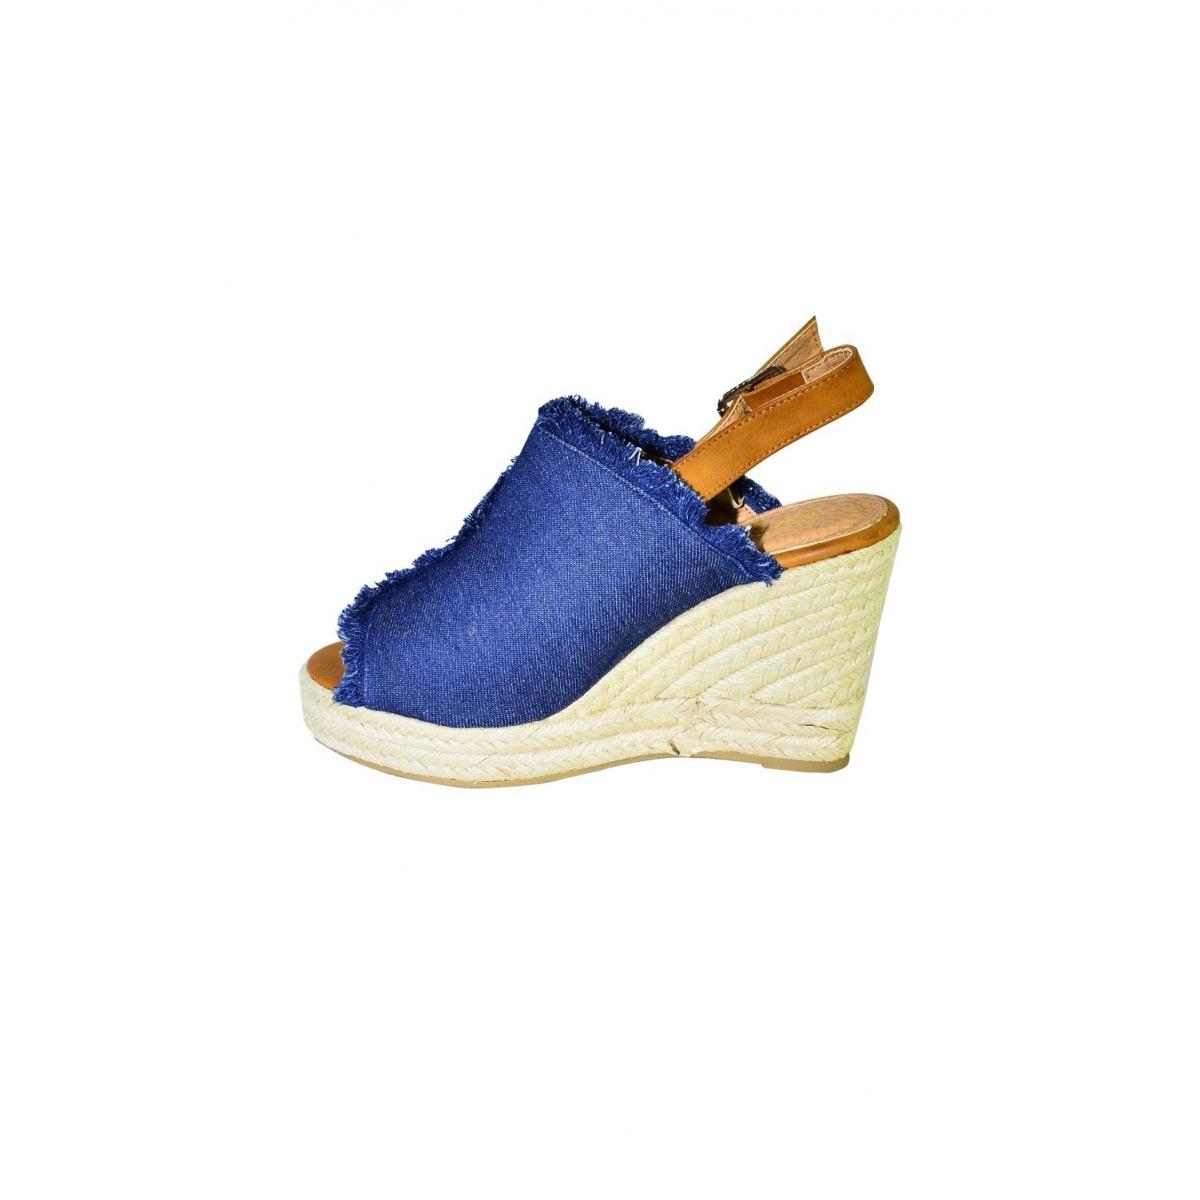 dc64a19543b4 Dámske tmavomodré sandále KATHIN - 6